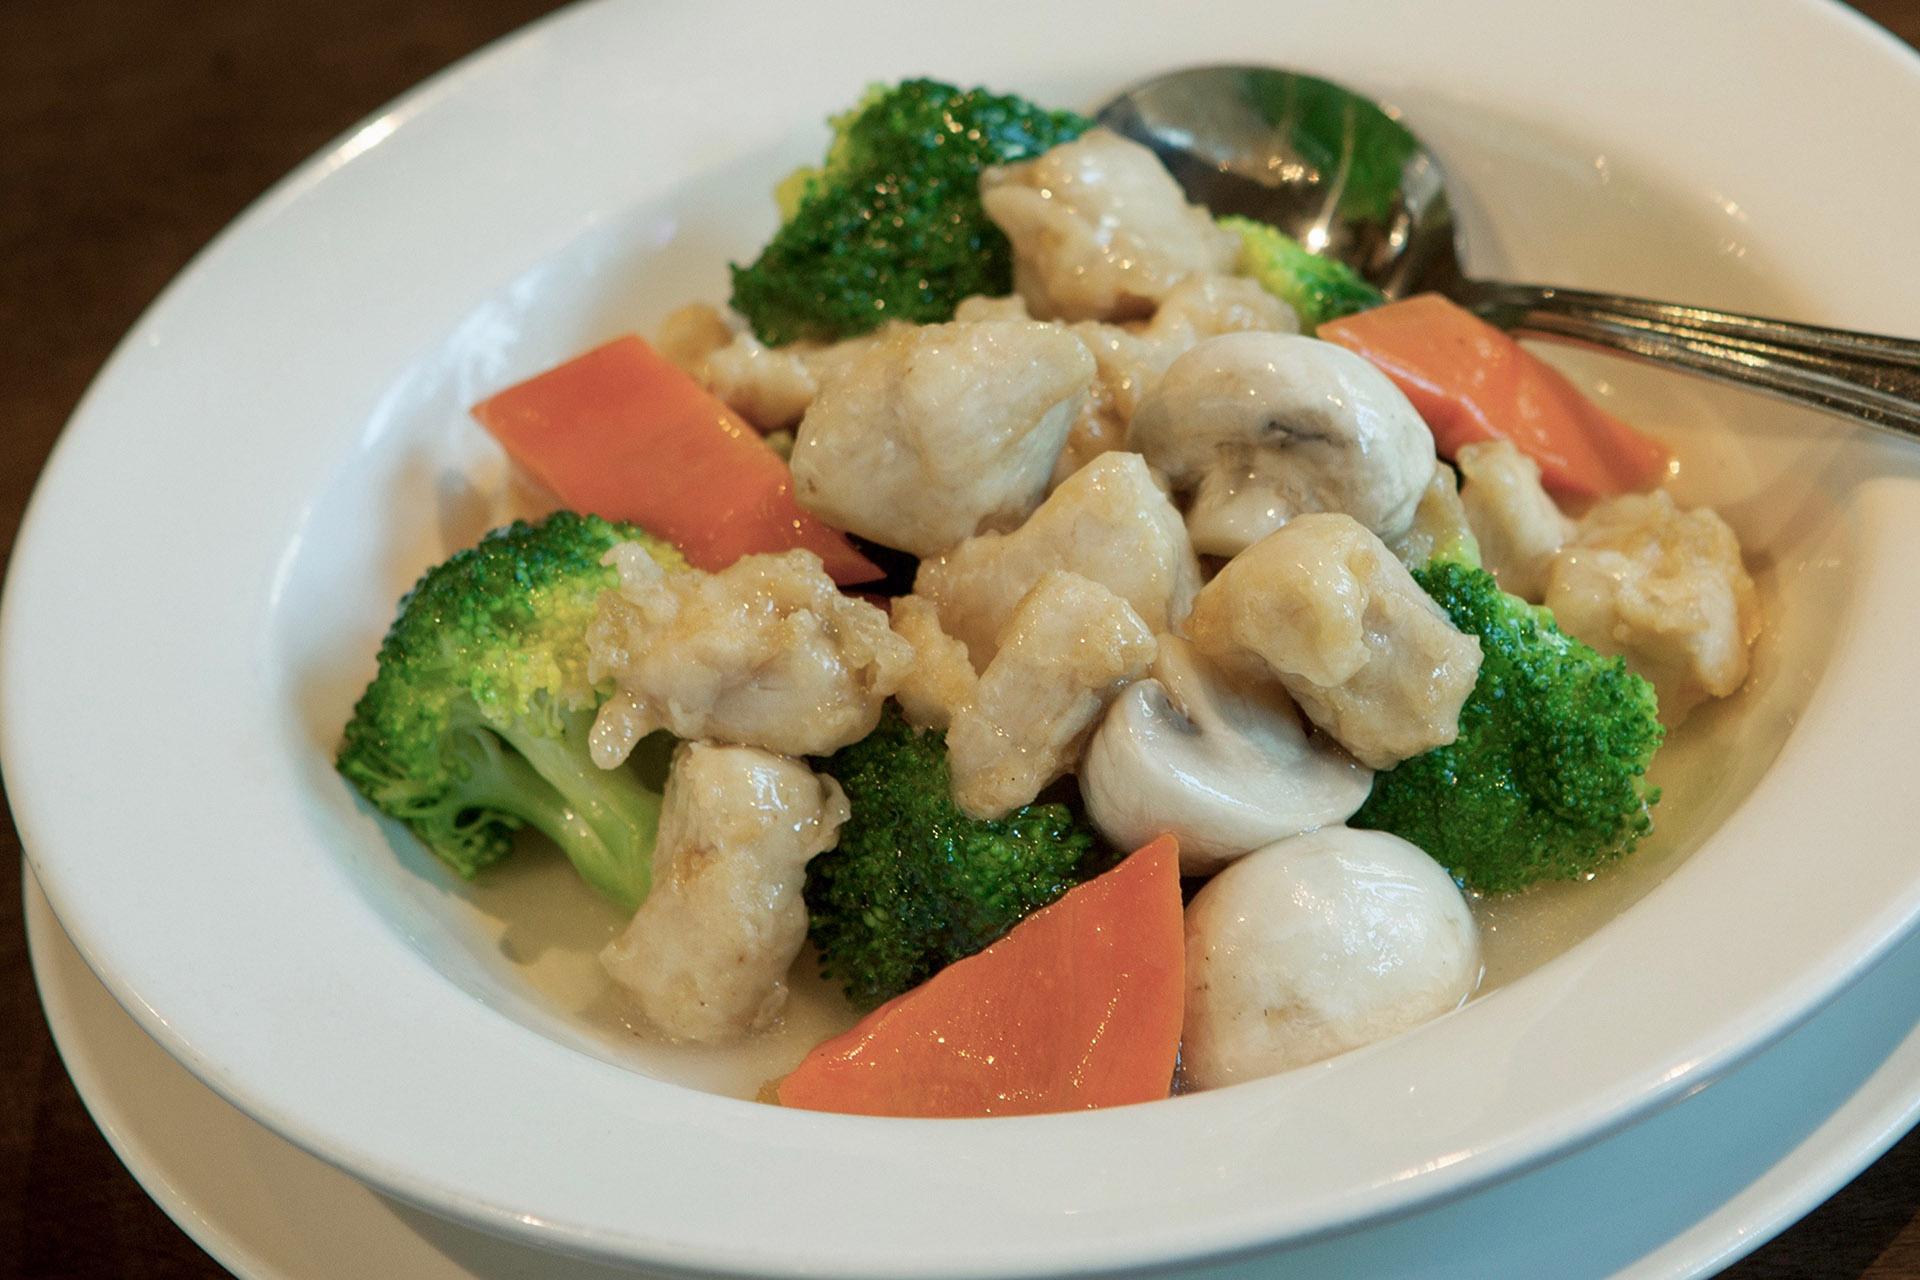 Chicken & Broccoli at Lee Chen Asian Bistro